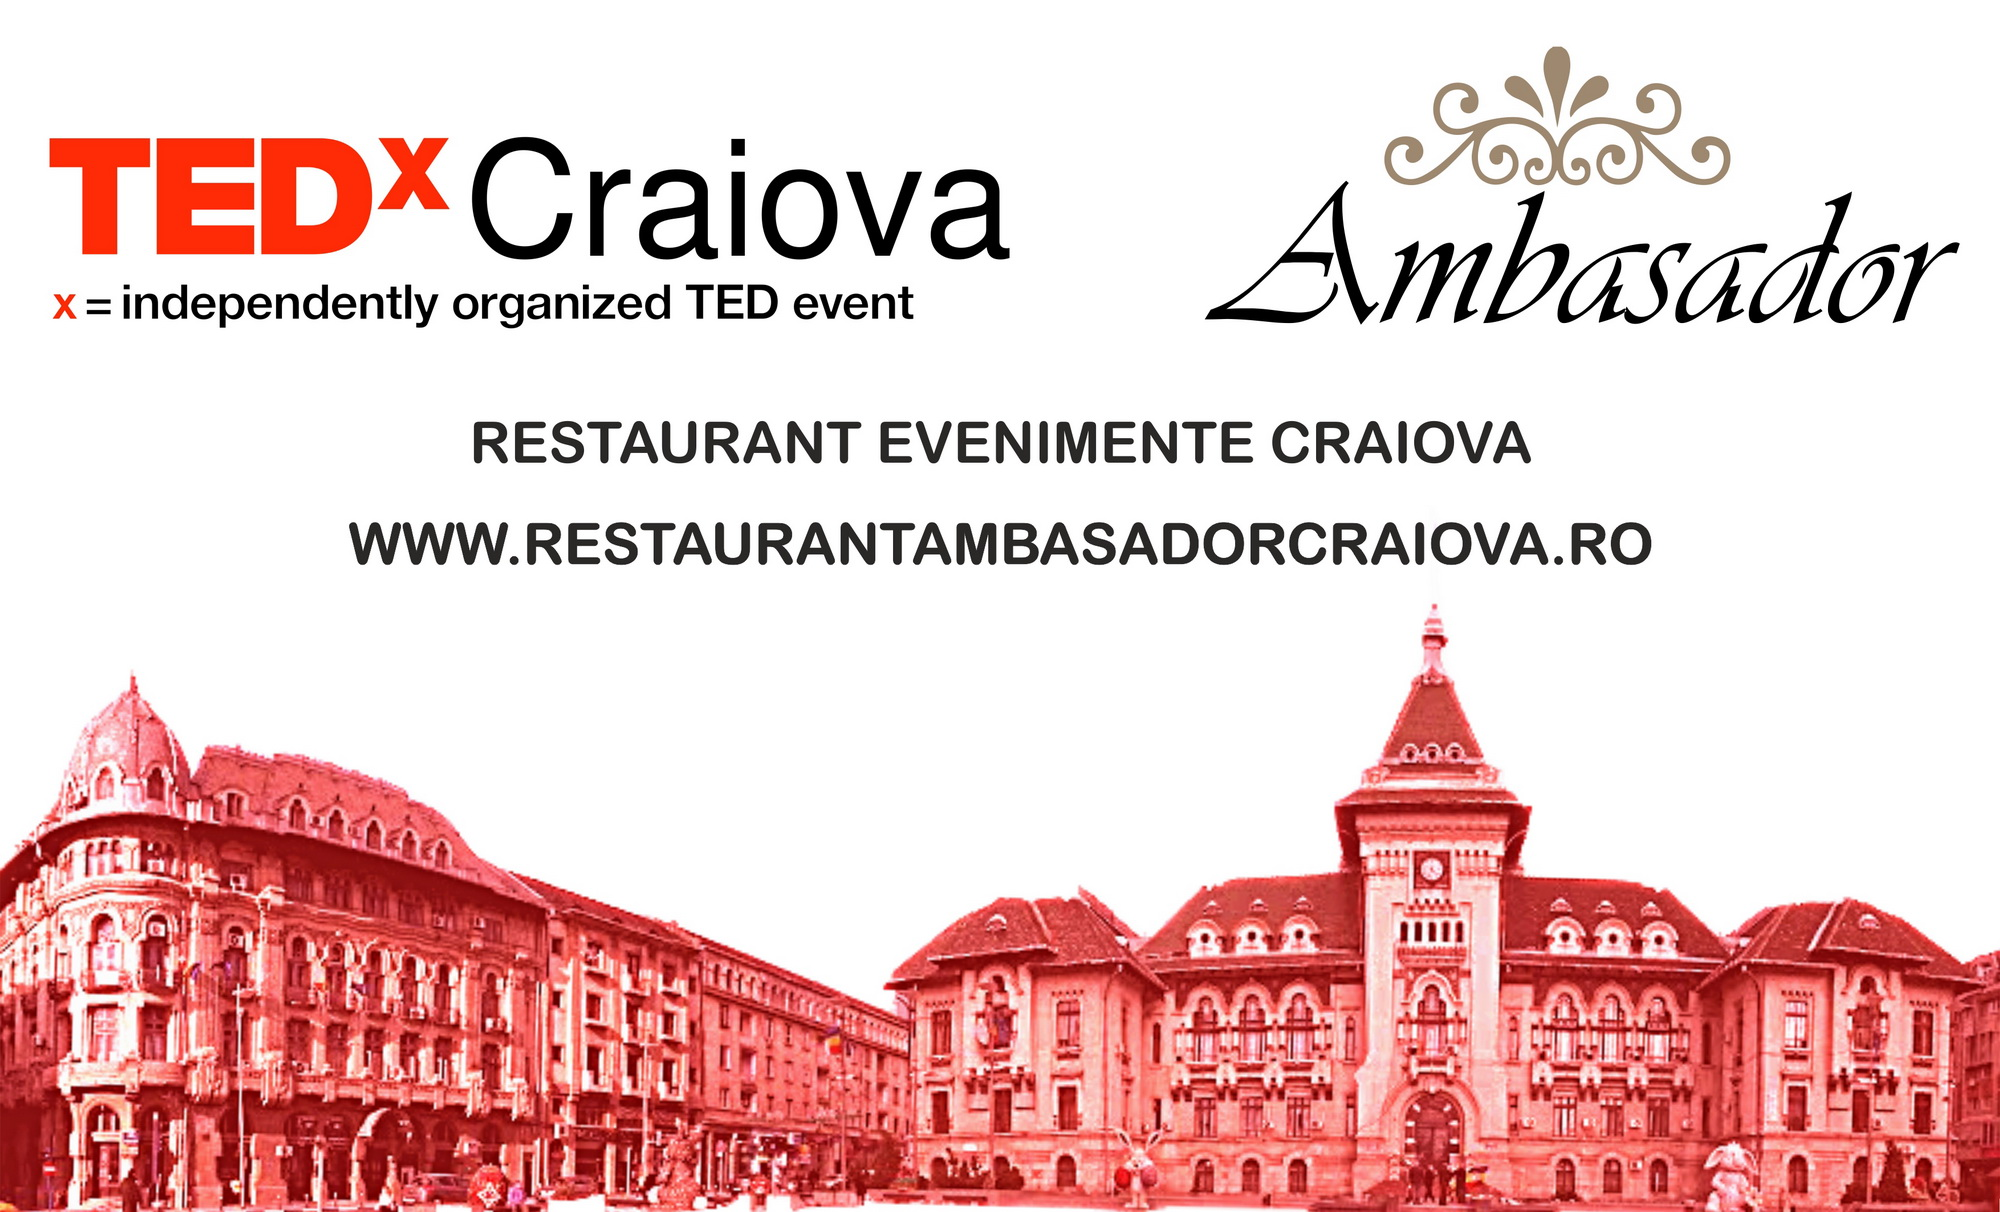 Restaurant Ambasador Craiova este Sponsor Oficial pentru Tedx Craiova | Restaurant Nunta, Botez, Corporate, Evenimente Craiova | Ambasador Center Craiova